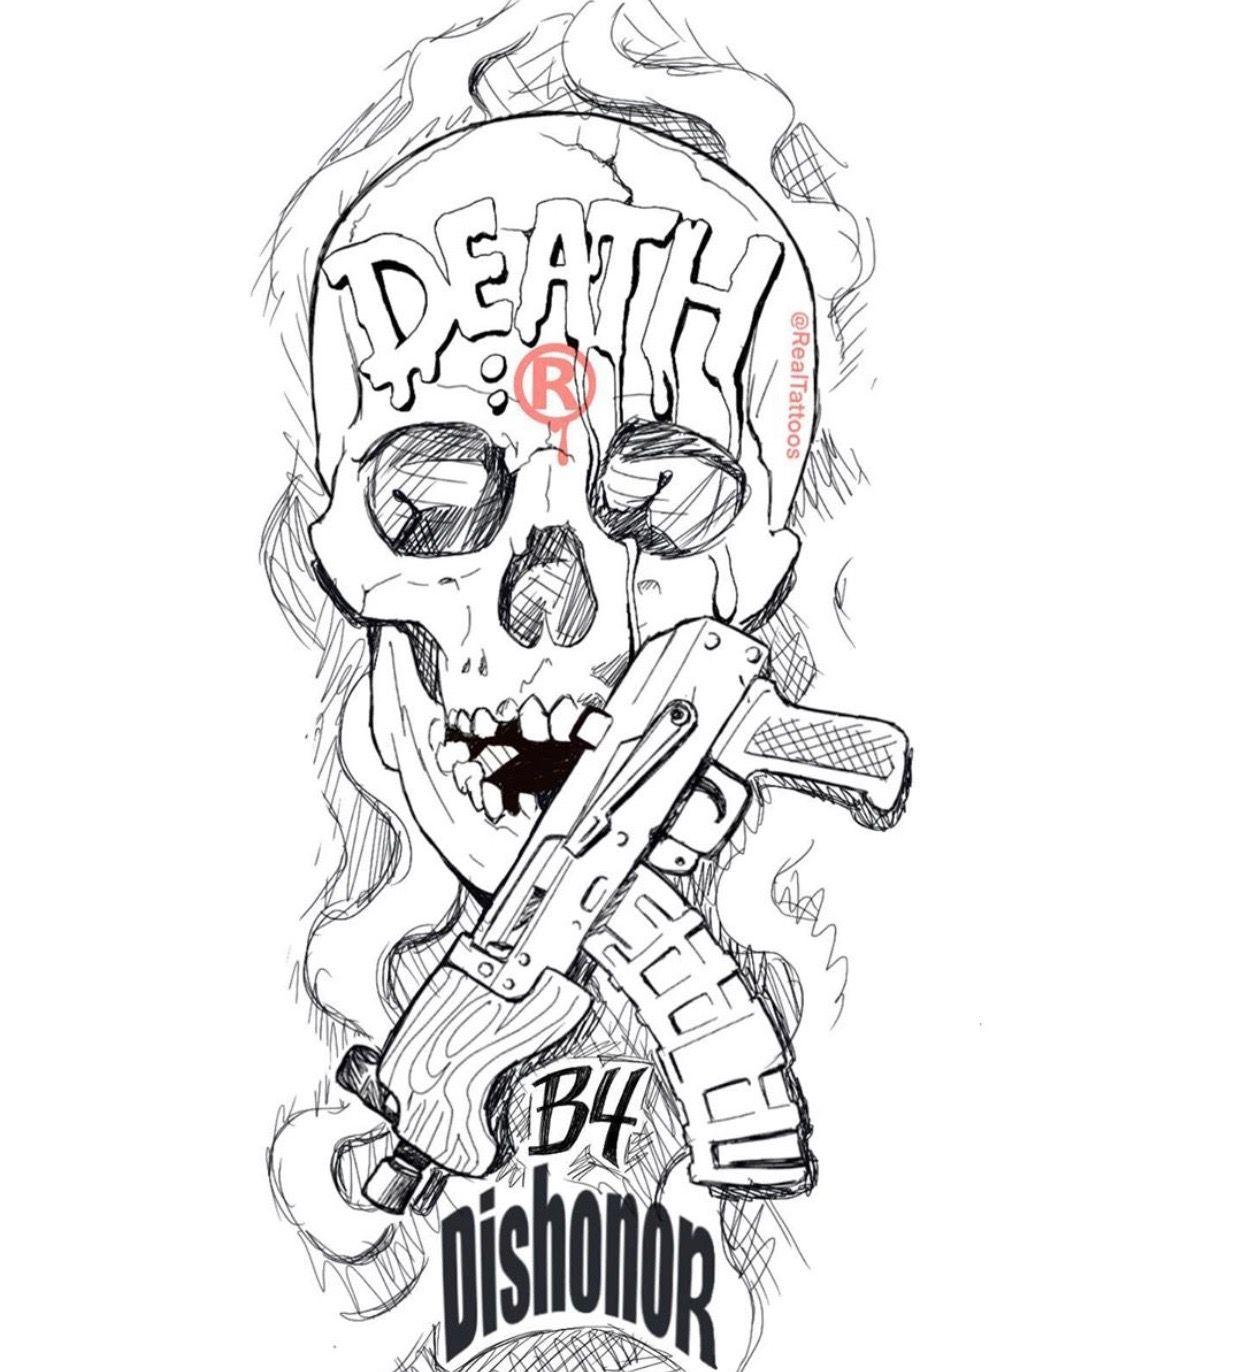 Pin By Ferb Foenem On Dude Tatts Half Sleeve Tattoos Drawings Tattoo Designs Men Forearm Sleeve Tattoos